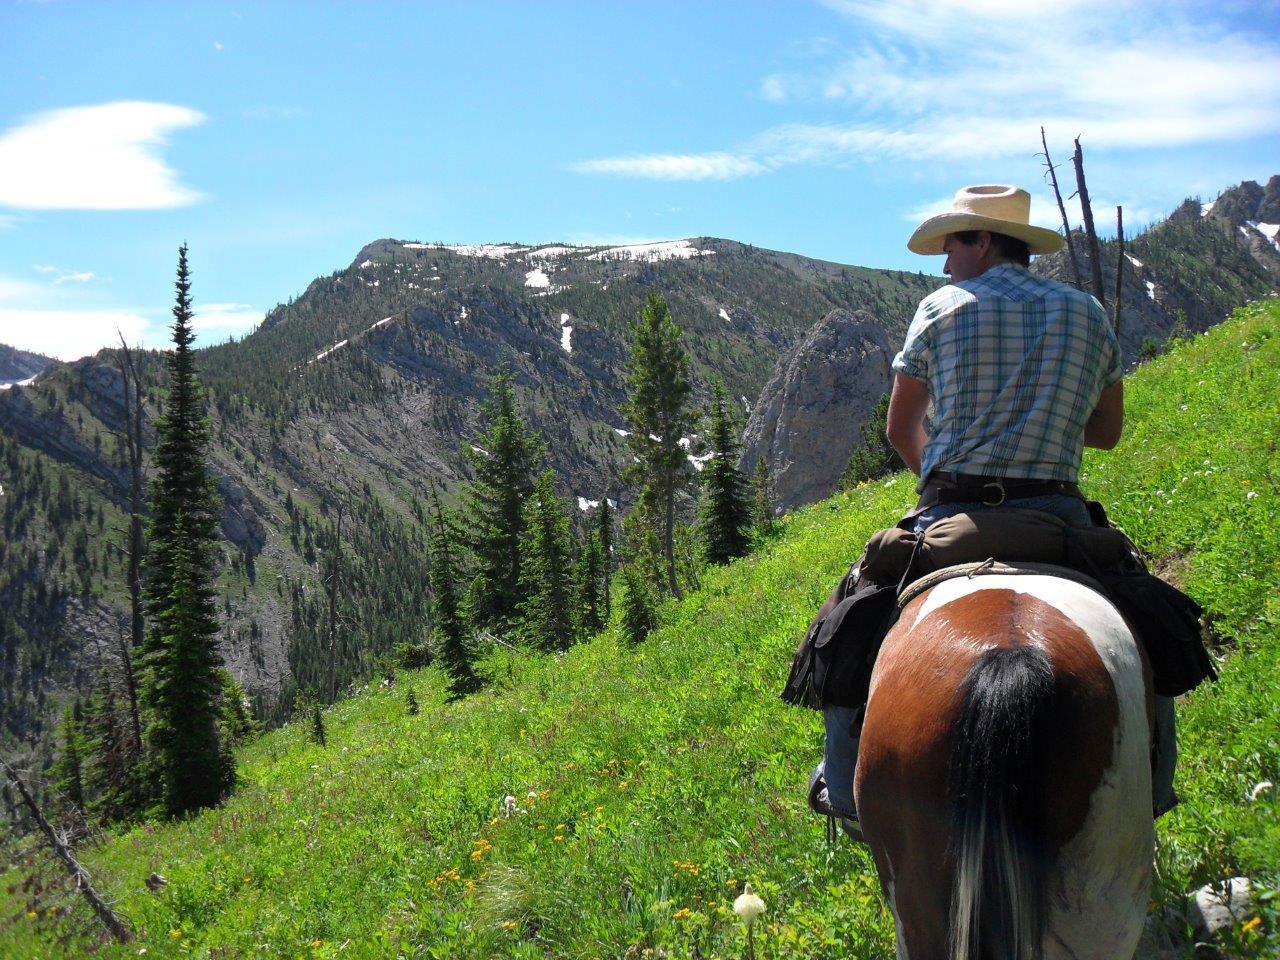 Bob-Marshall-wilderness-on-horseback.jpg